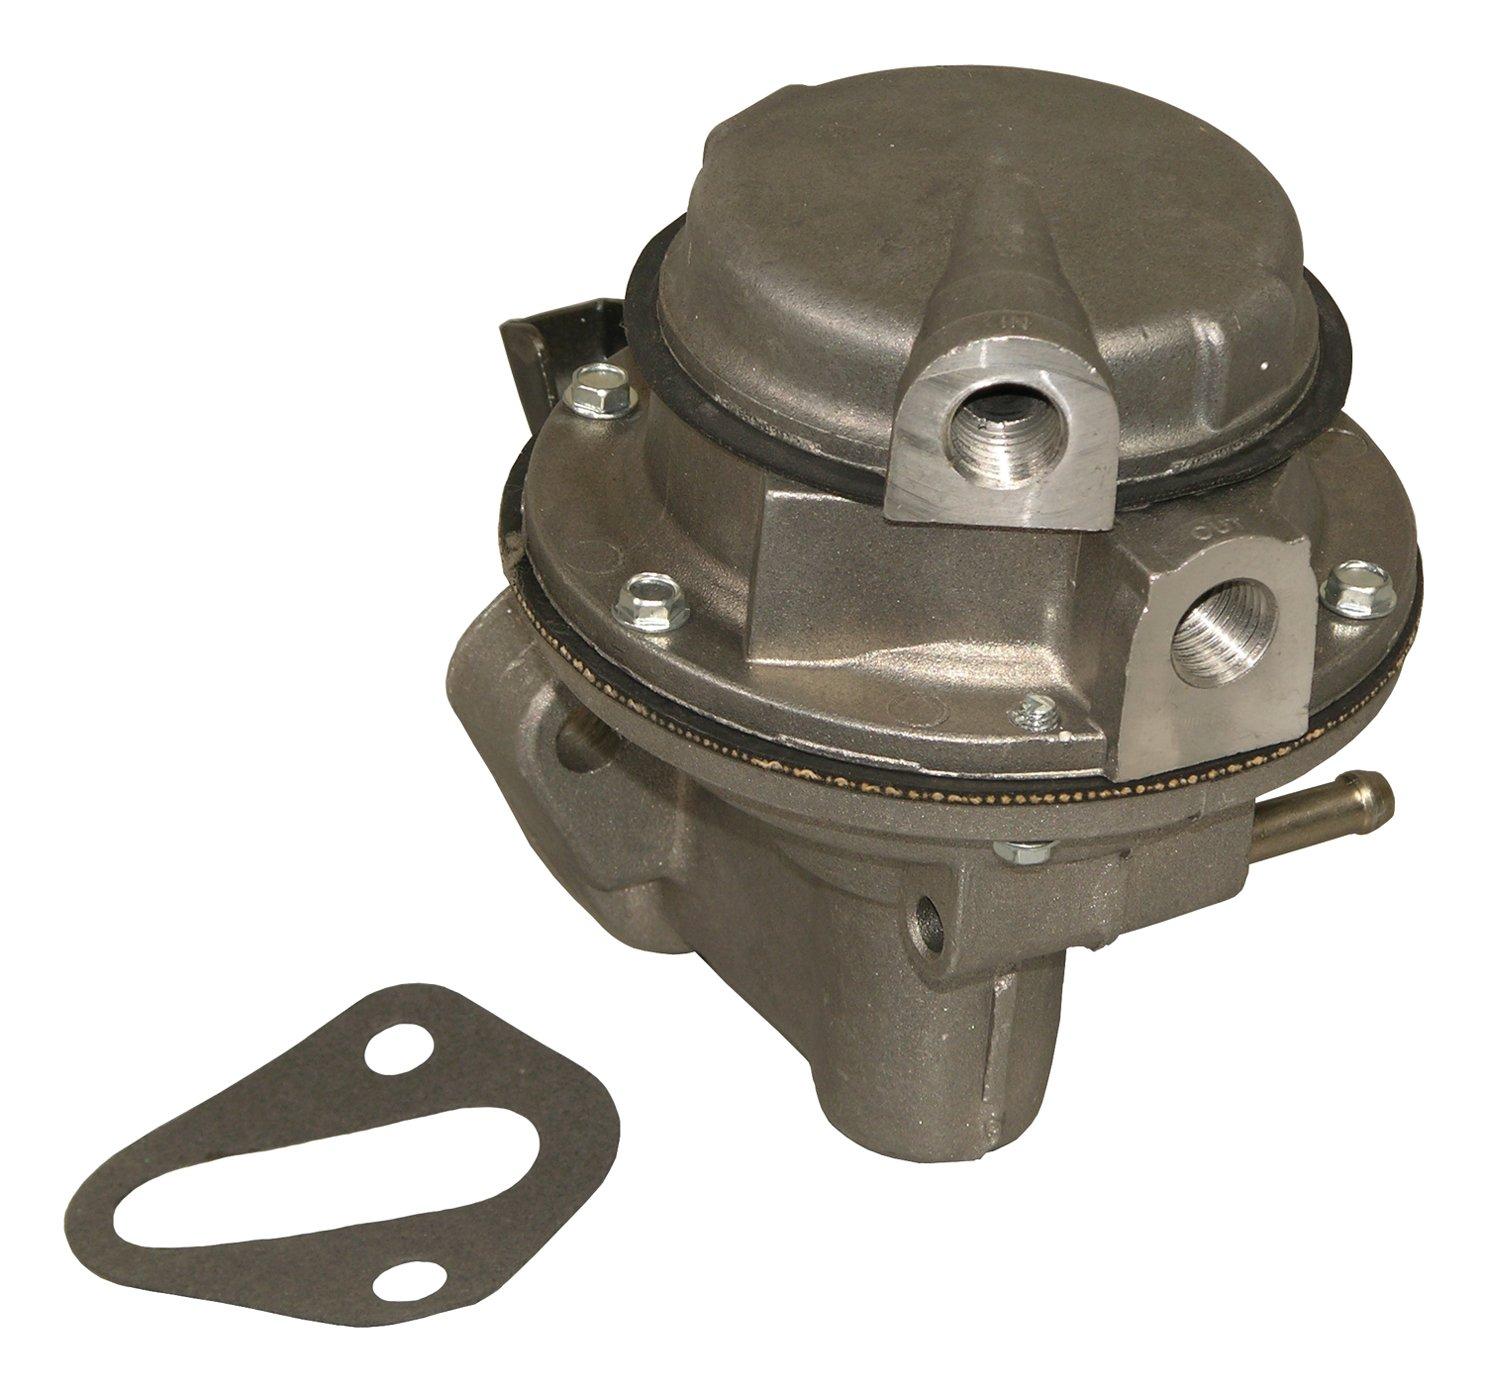 Airtex 60501 Mechanical Fuel Pump for 1984 Crusader Marine 327 8 Cylinder